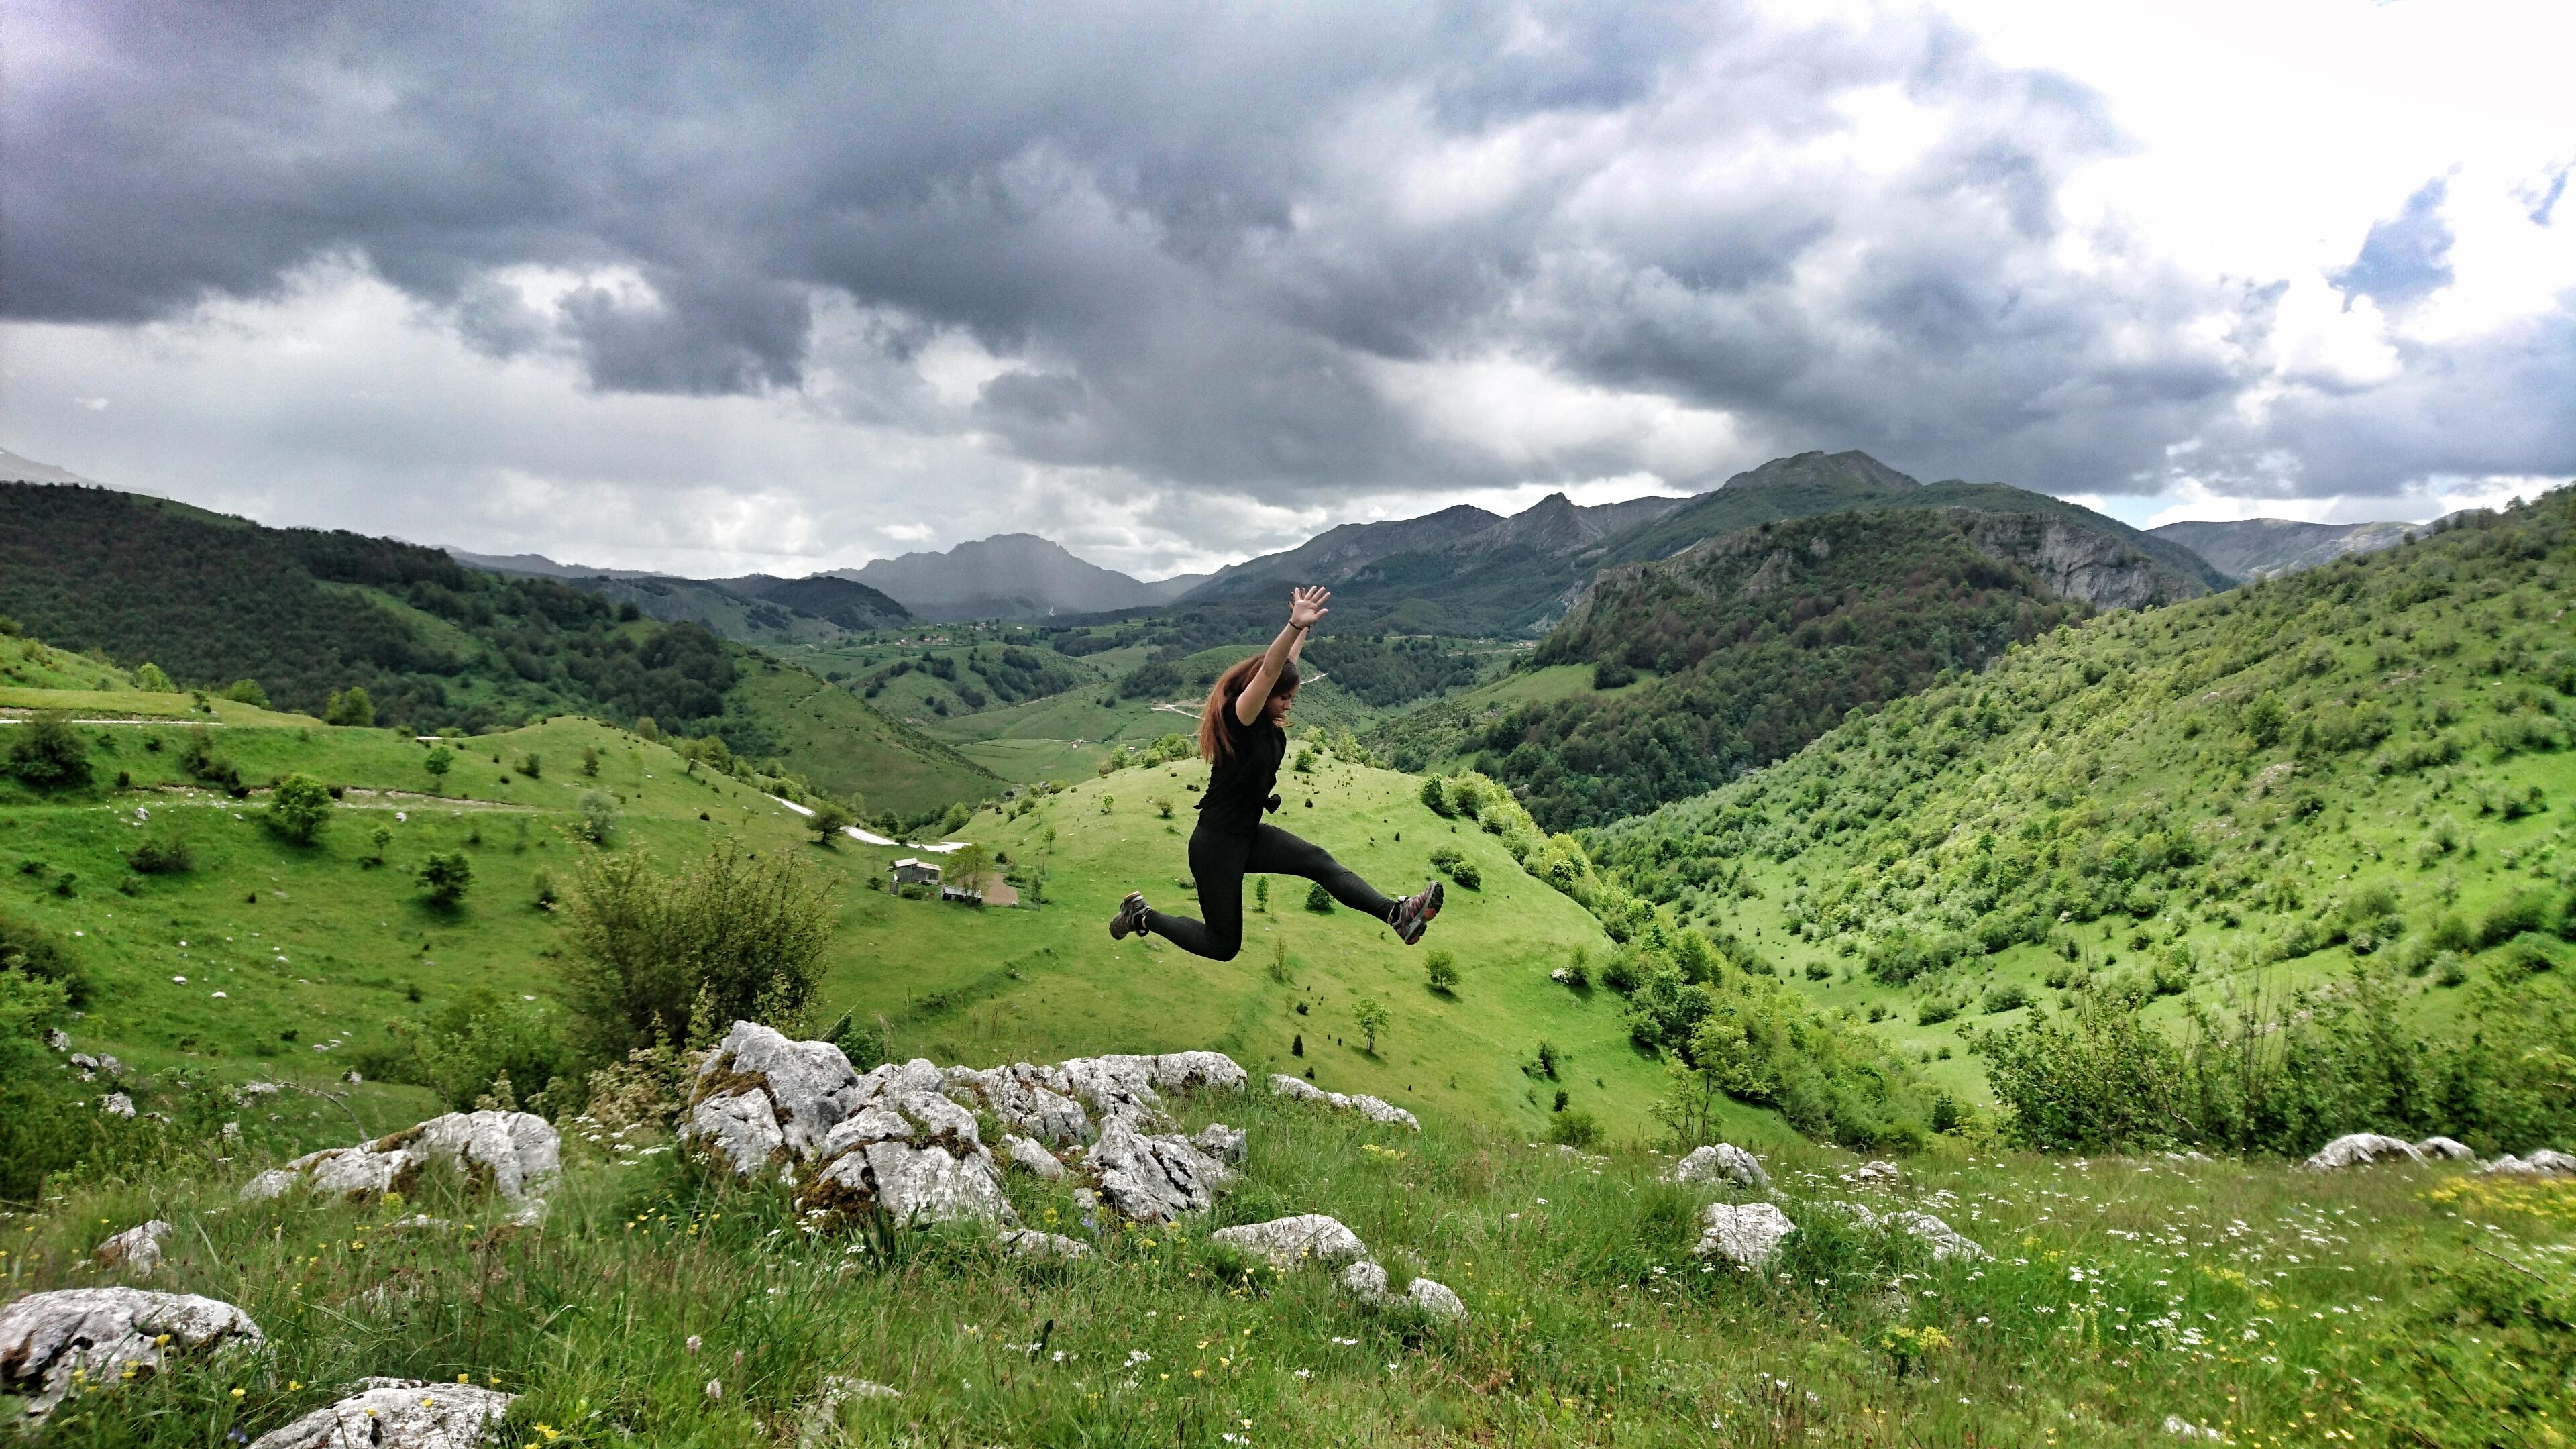 My ninja jump in the mountains